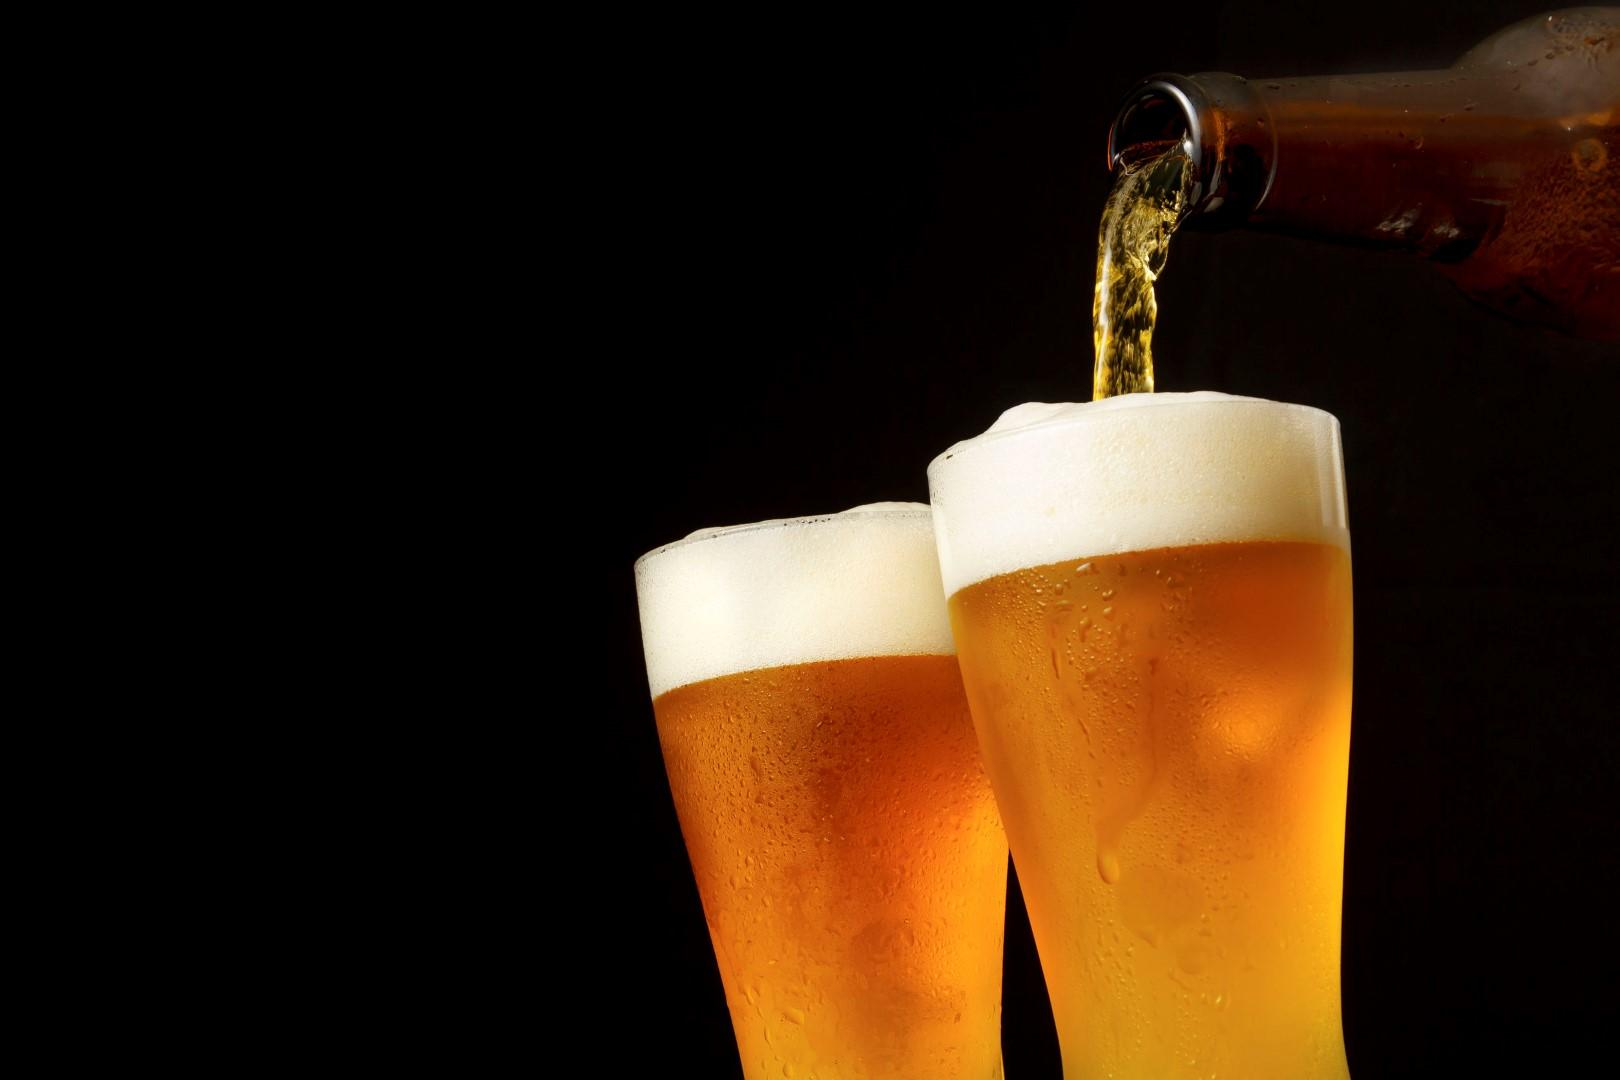 Birra, passione curiosa